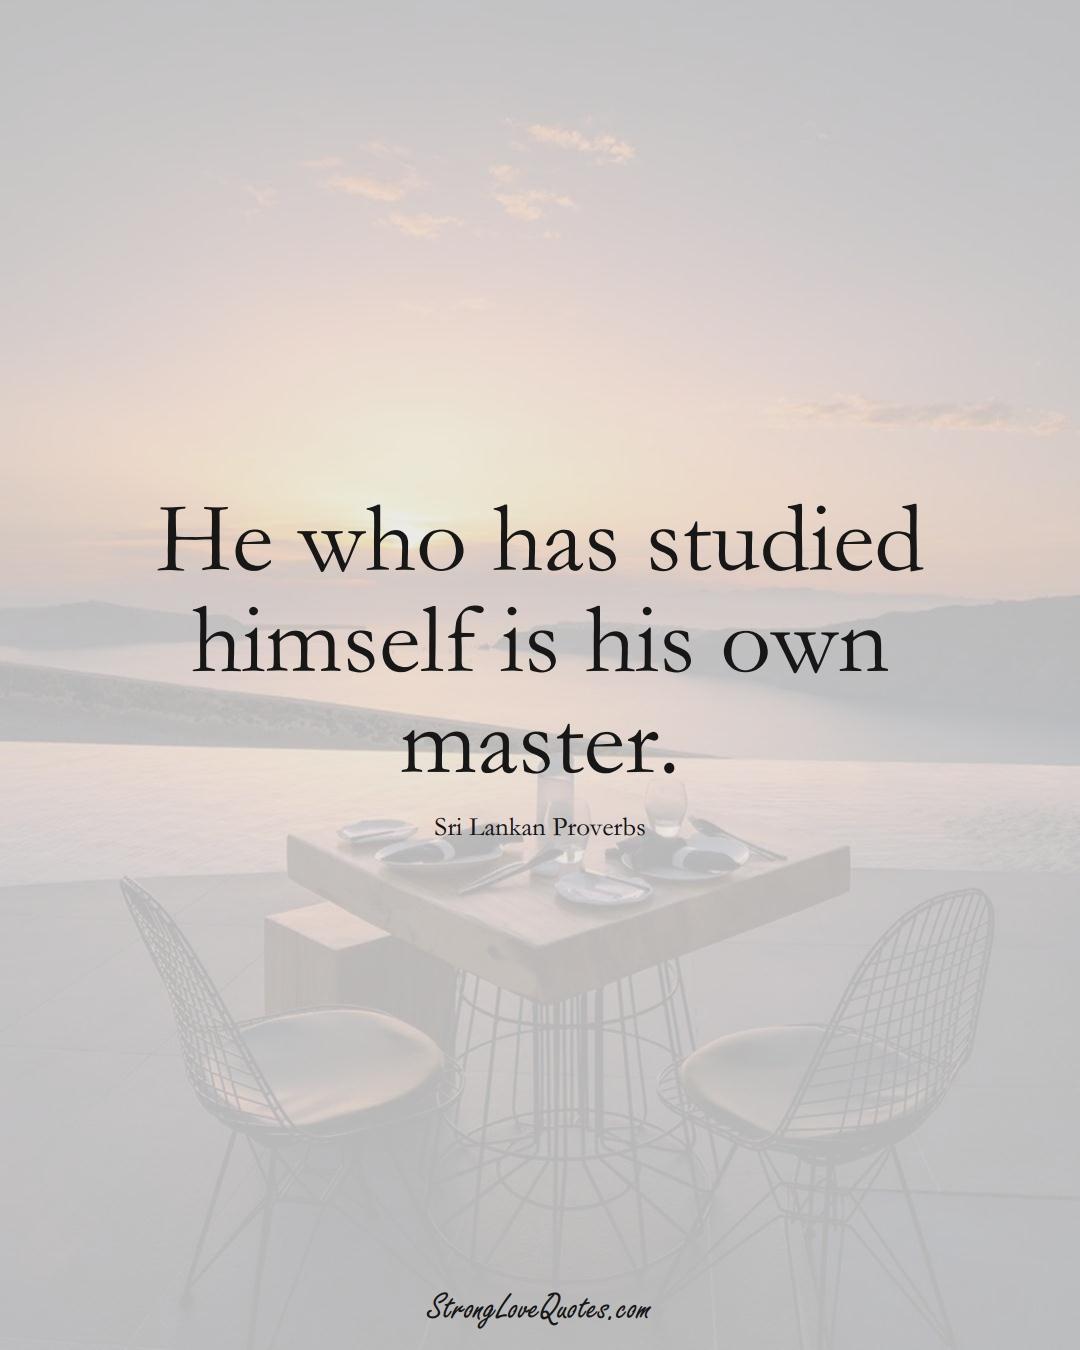 He who has studied himself is his own master. (Sri Lankan Sayings);  #AsianSayings